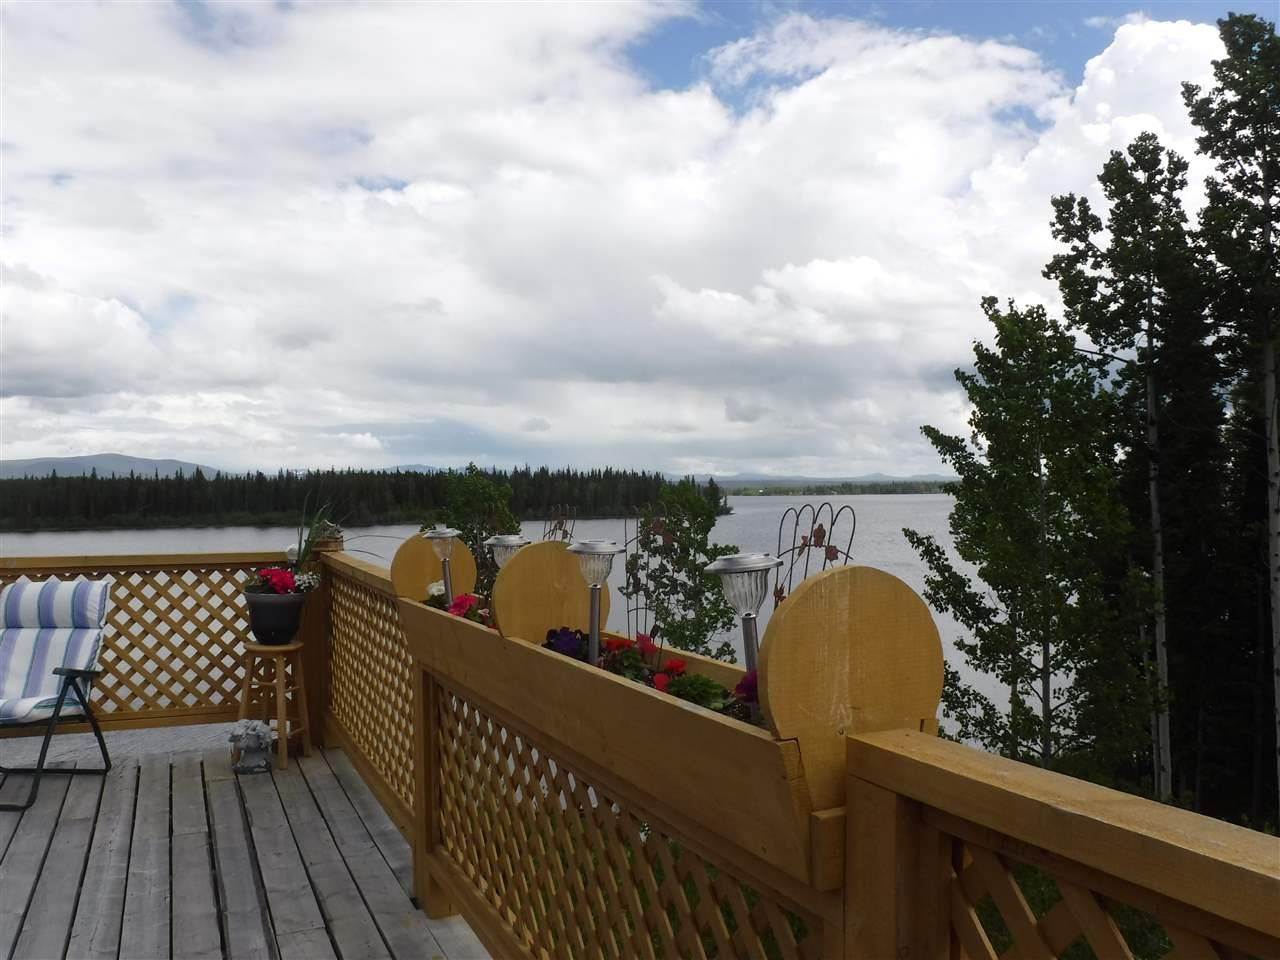 Photo 18: Photos: 3126 ELSEY Road in Williams Lake: Williams Lake - Rural West House for sale (Williams Lake (Zone 27))  : MLS®# R2467730